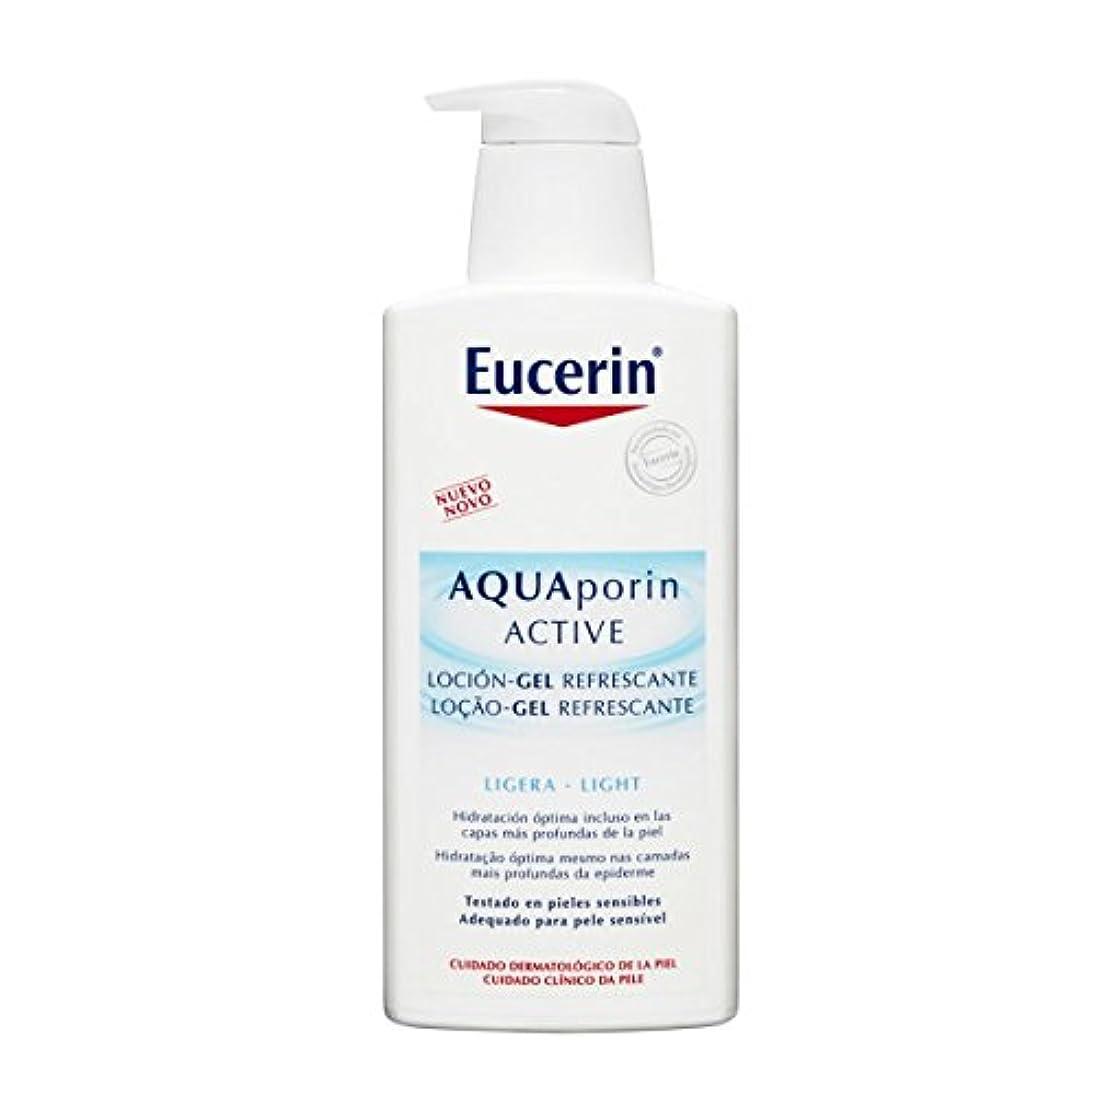 Eucerin Aquaporin Active Intense Body Balm 400ml [並行輸入品]